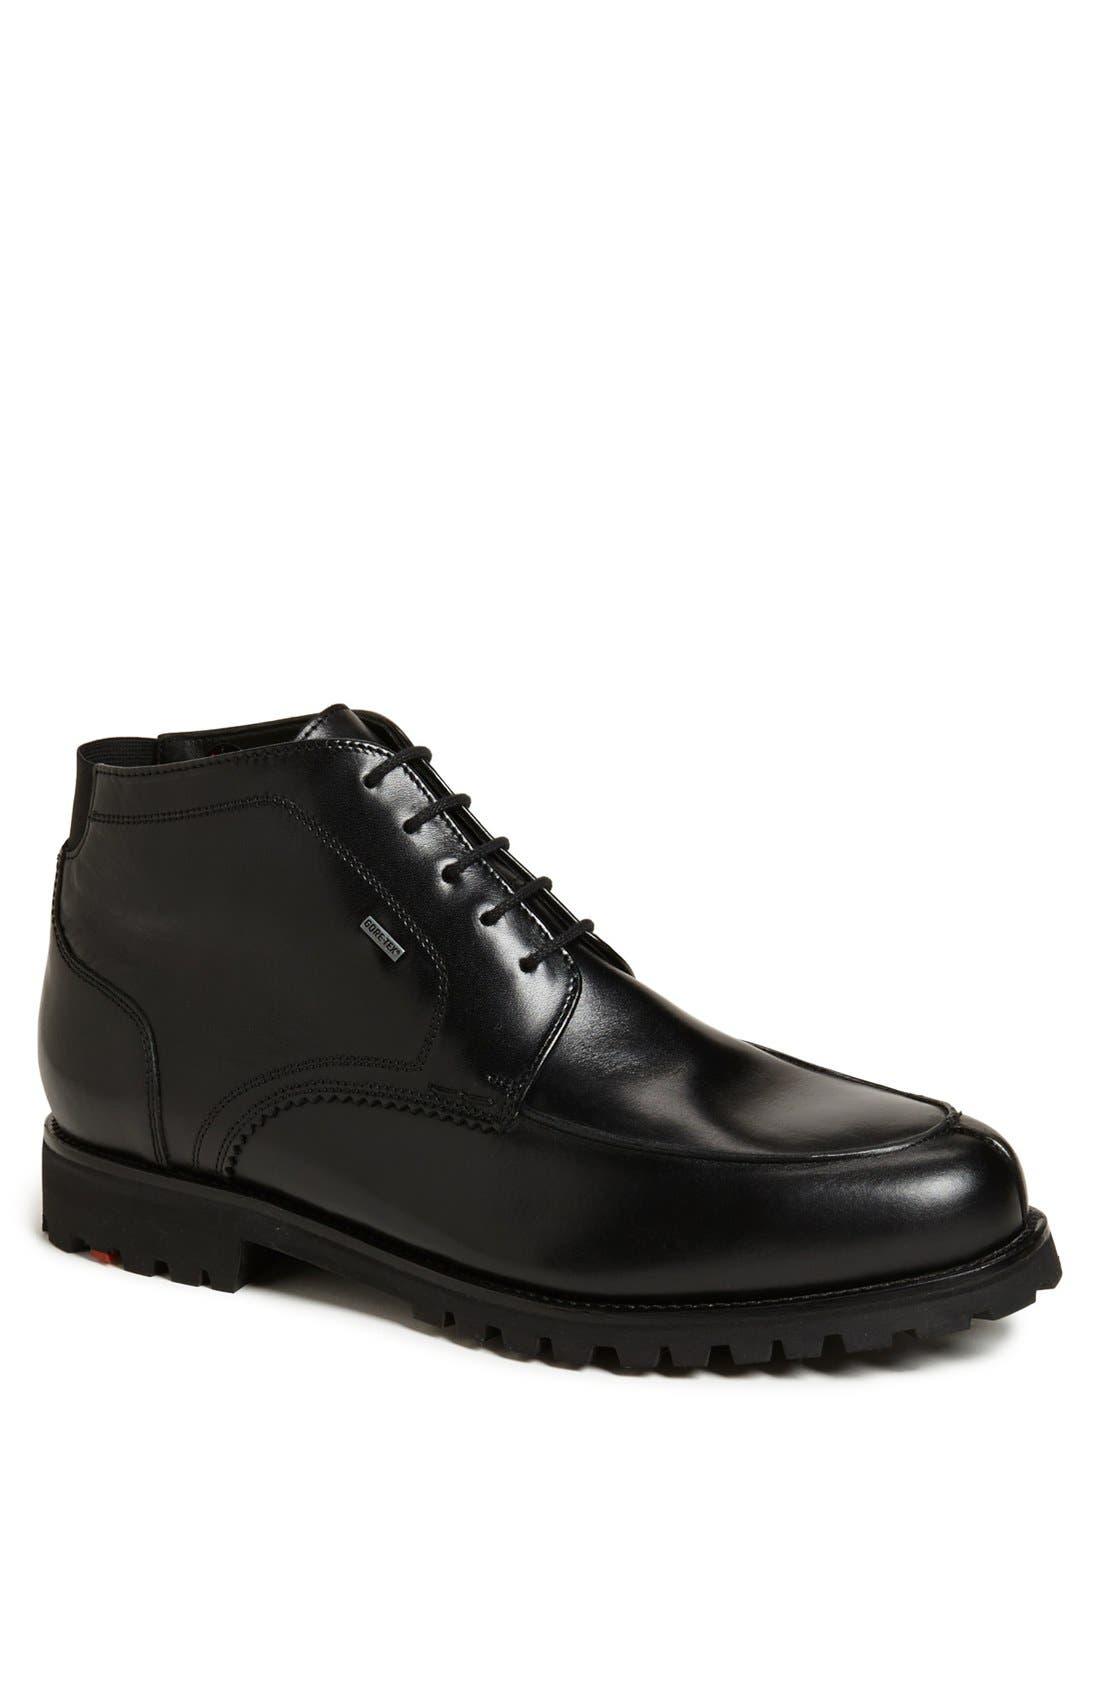 Alternate Image 1 Selected - Lloyd 'Varello' Chukka Boot